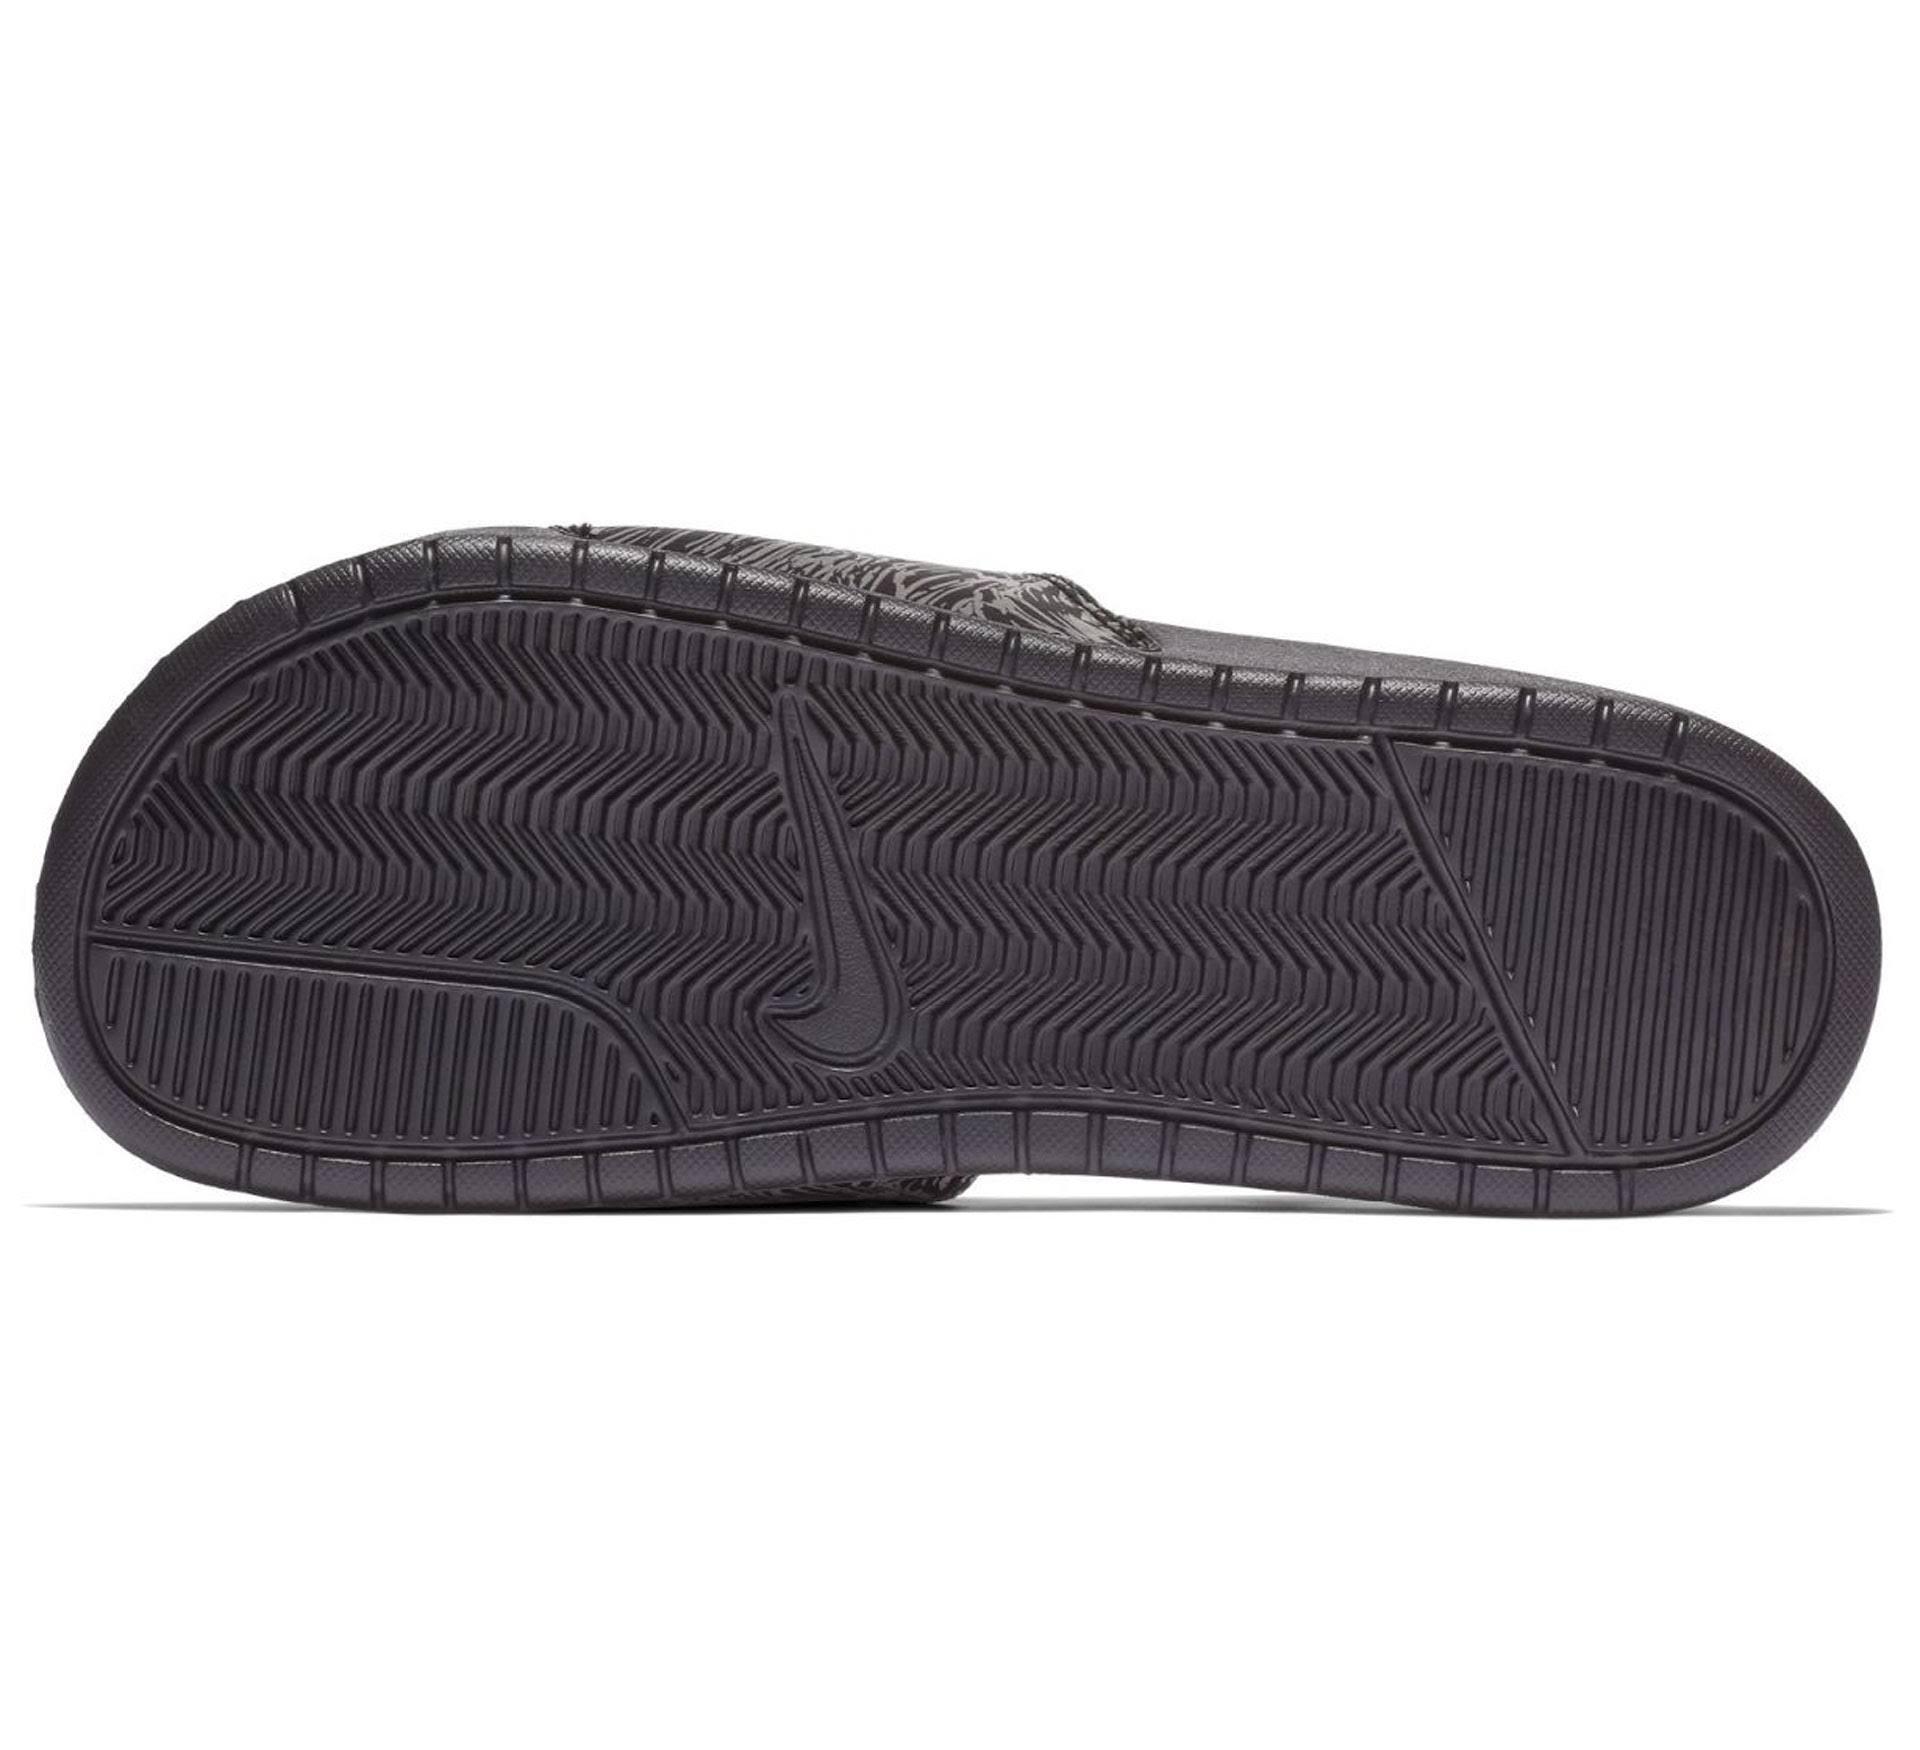 Weiß Schwarz Jdi Benassi Slipper Nike Print wXqpTxv8